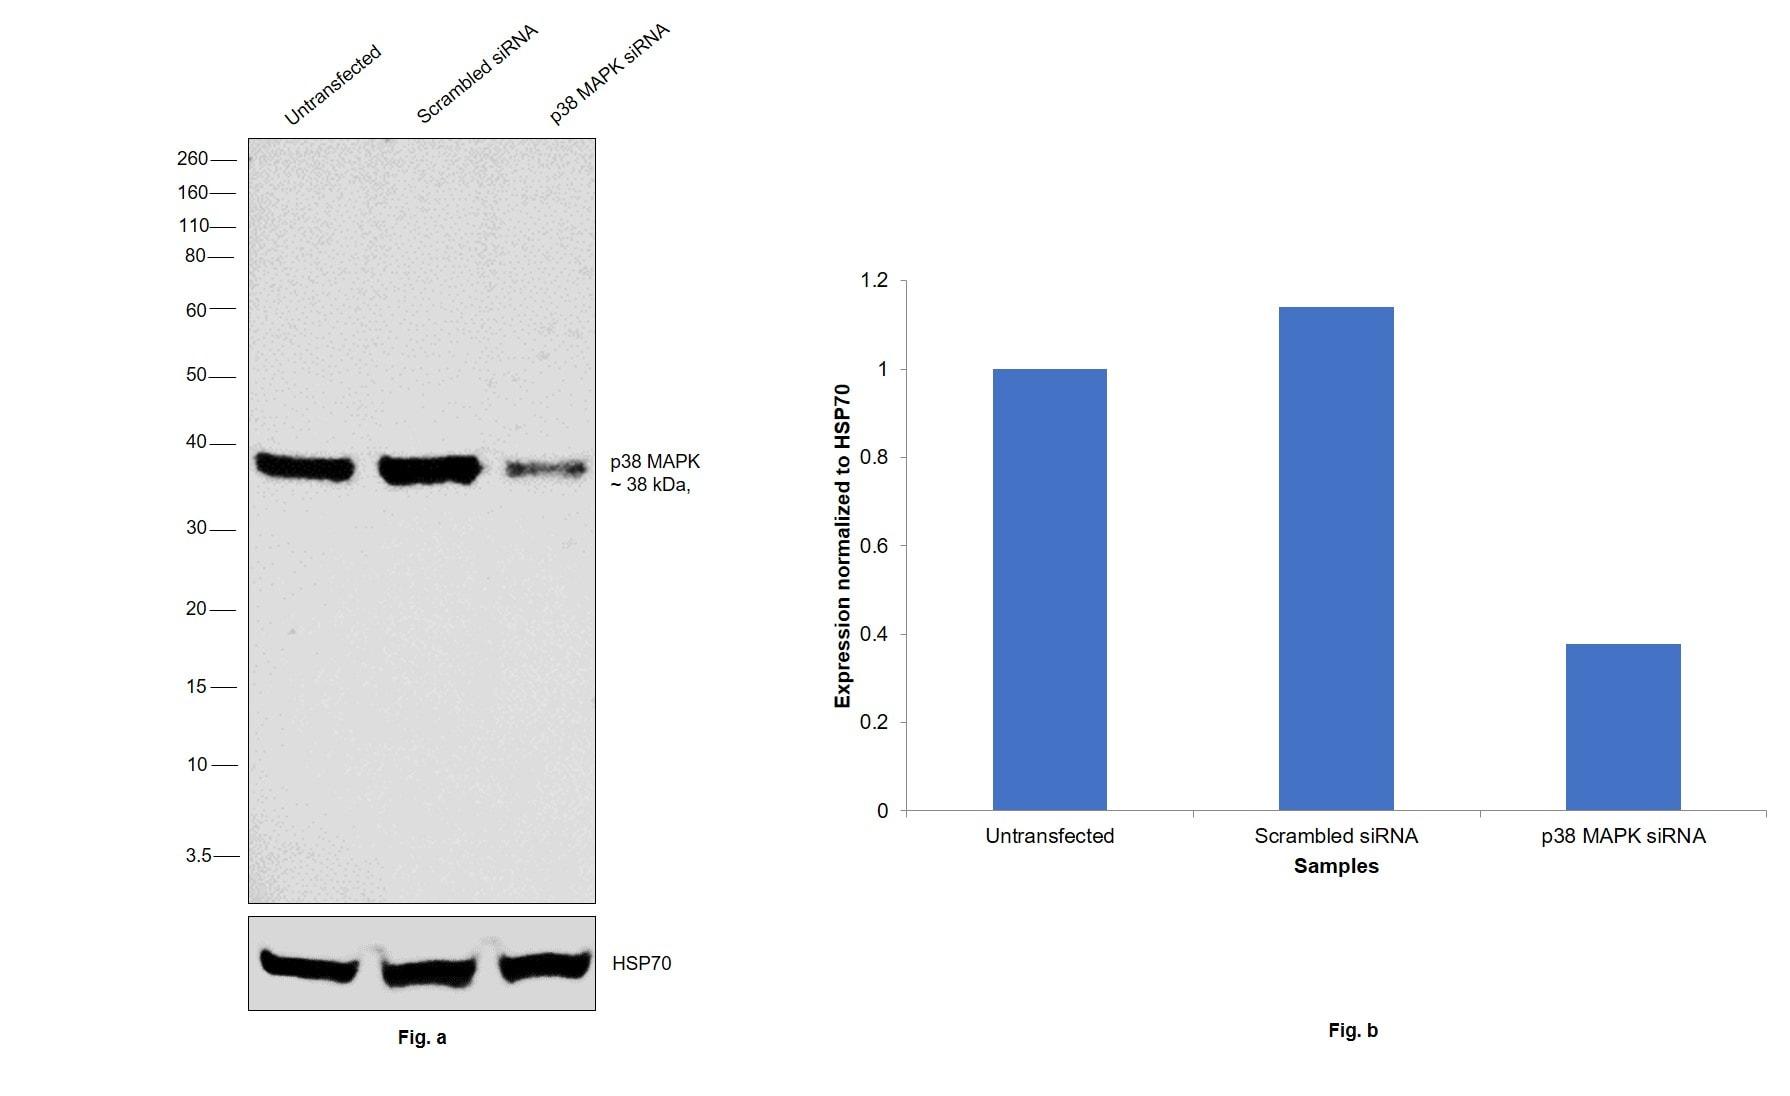 p38 MAPK alpha Antibody in Western Blot (WB)